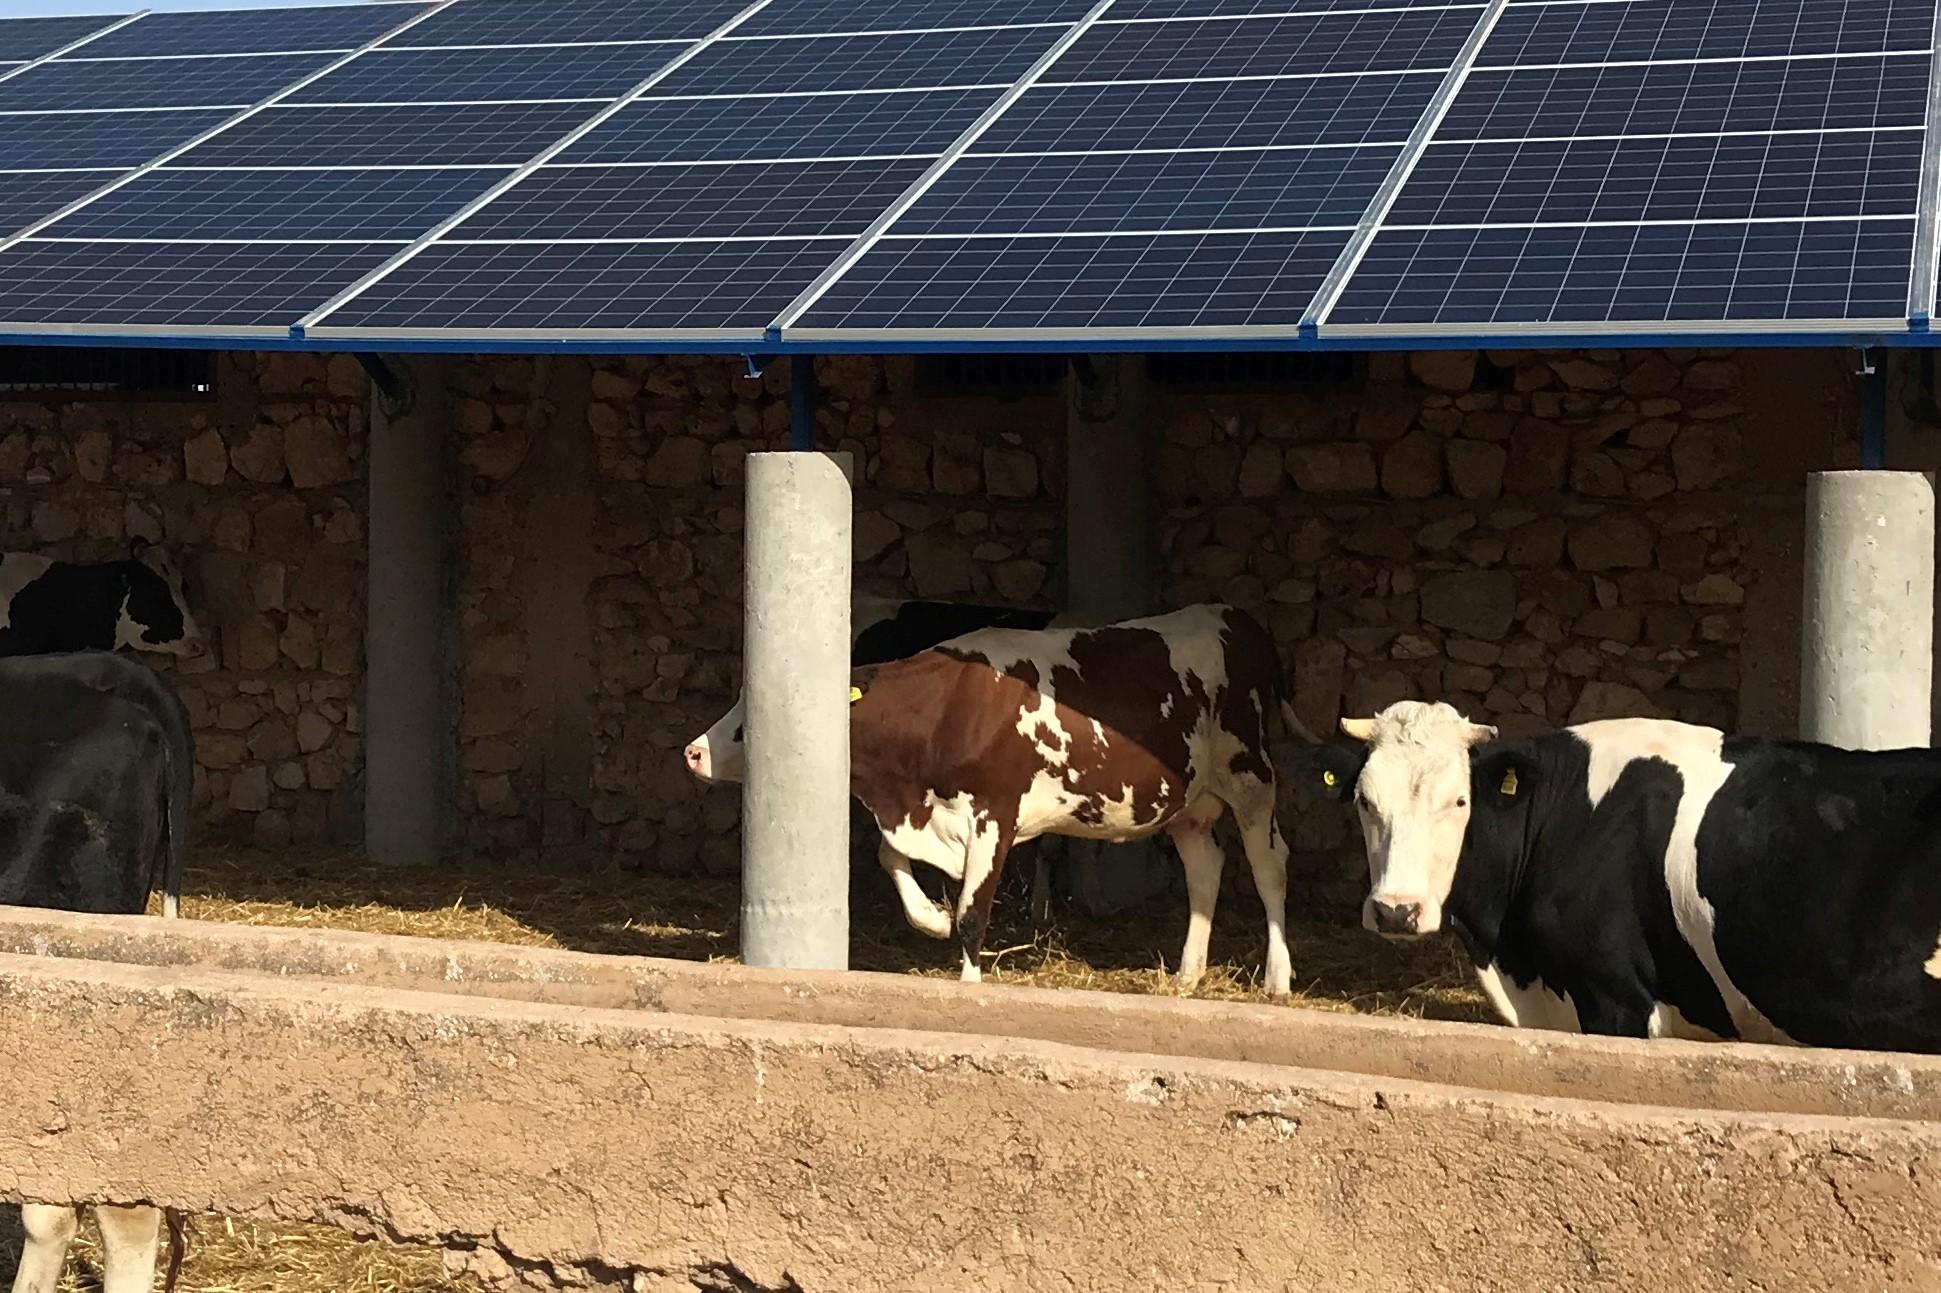 306 NACIRI - Solar extension